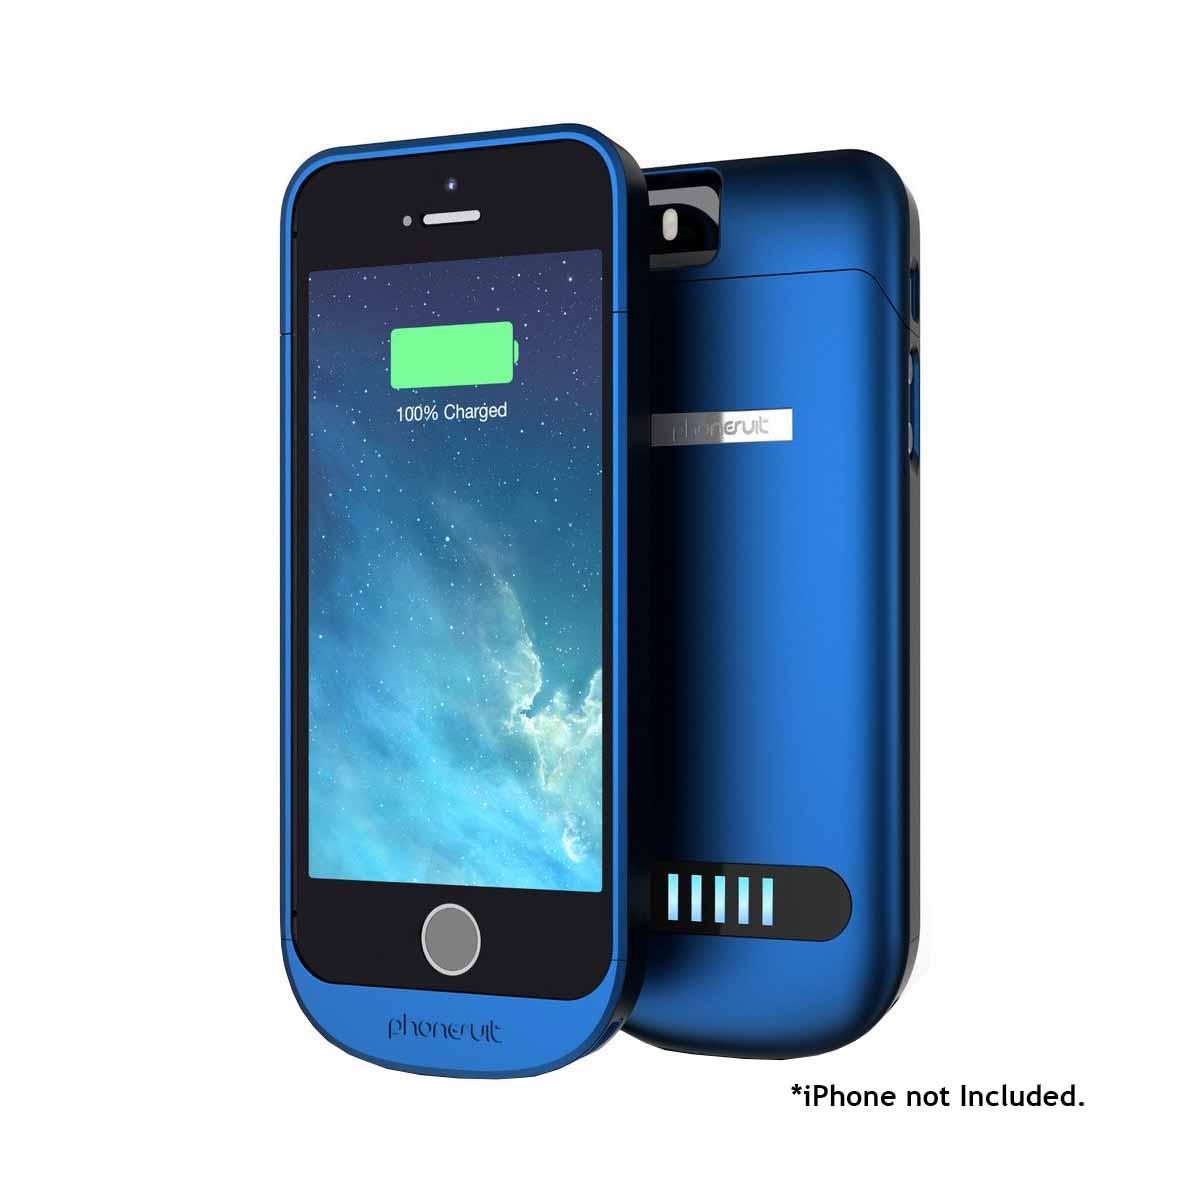 phonesuit elite 5 iphone 5 5s battery protective case 2100mah fast charger ebay. Black Bedroom Furniture Sets. Home Design Ideas